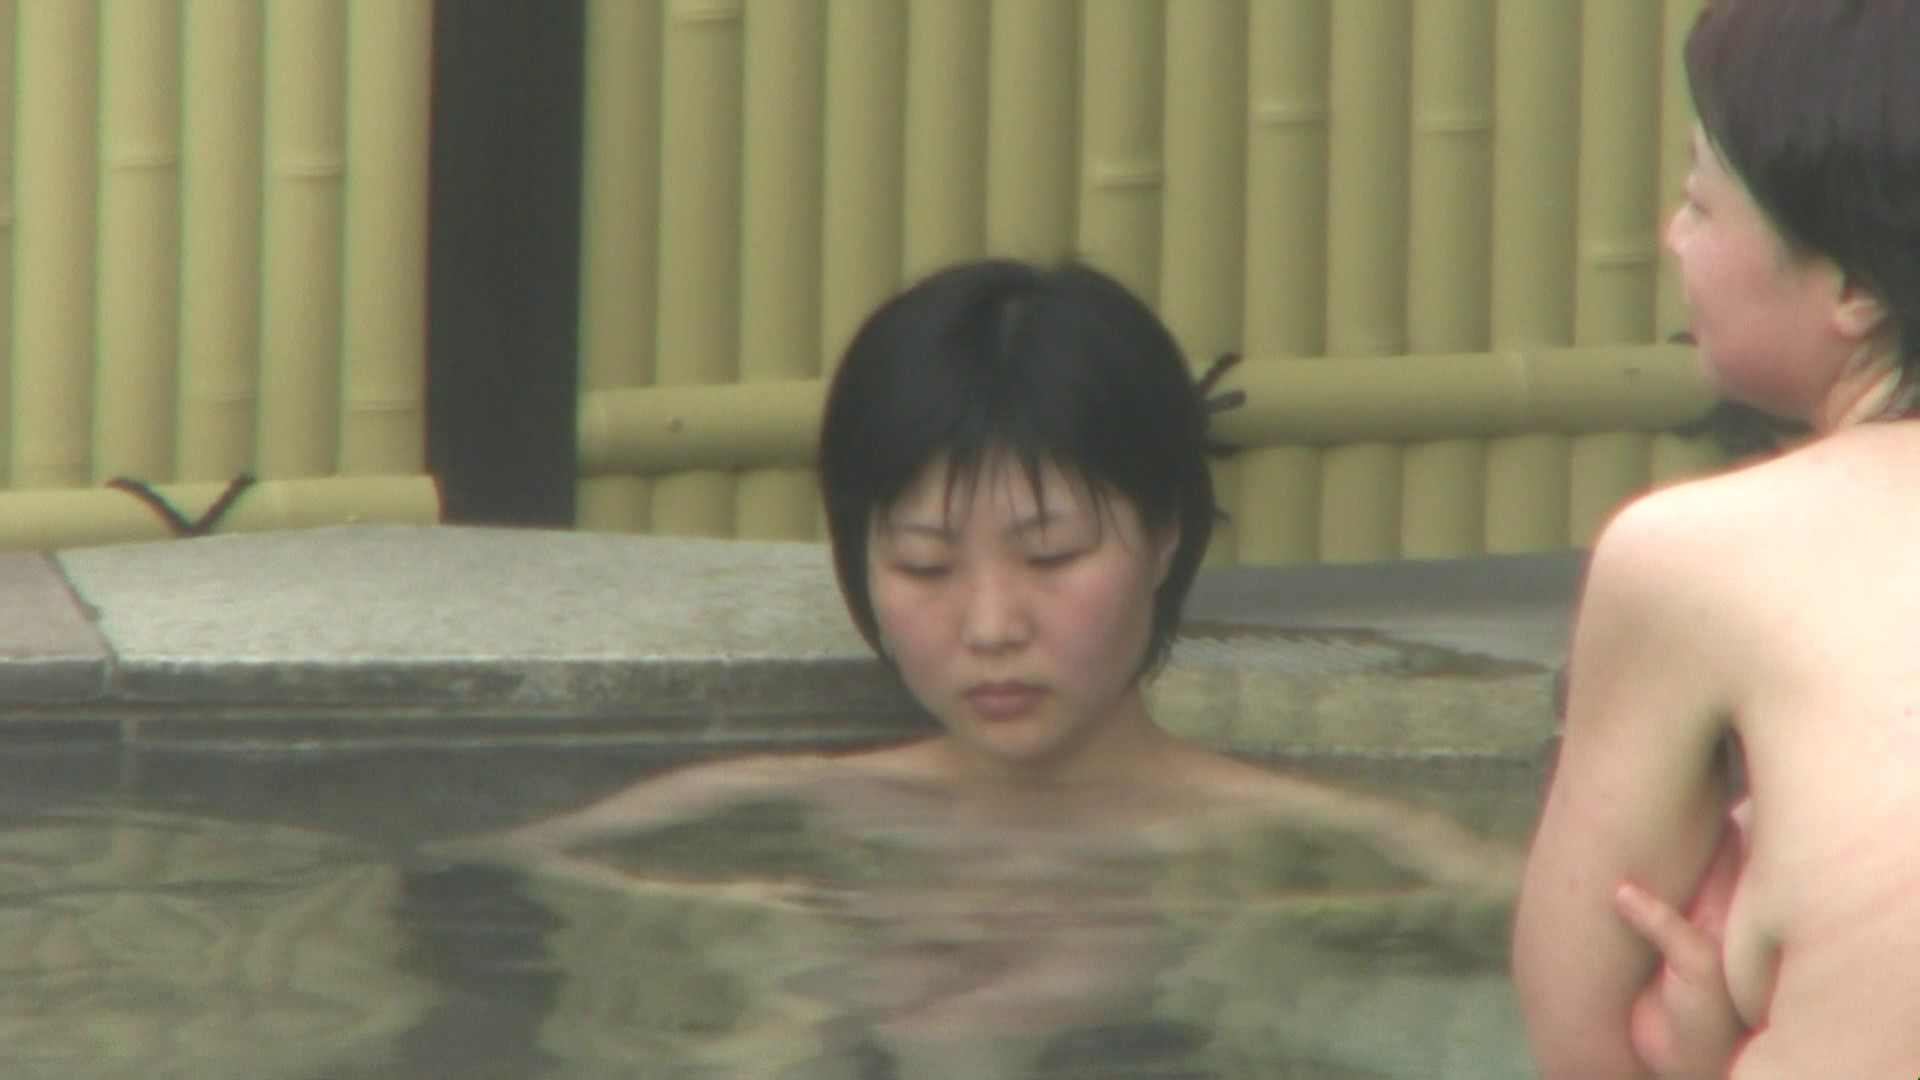 Aquaな露天風呂Vol.74【VIP限定】 露天風呂編 | 盗撮シリーズ  103PIX 83